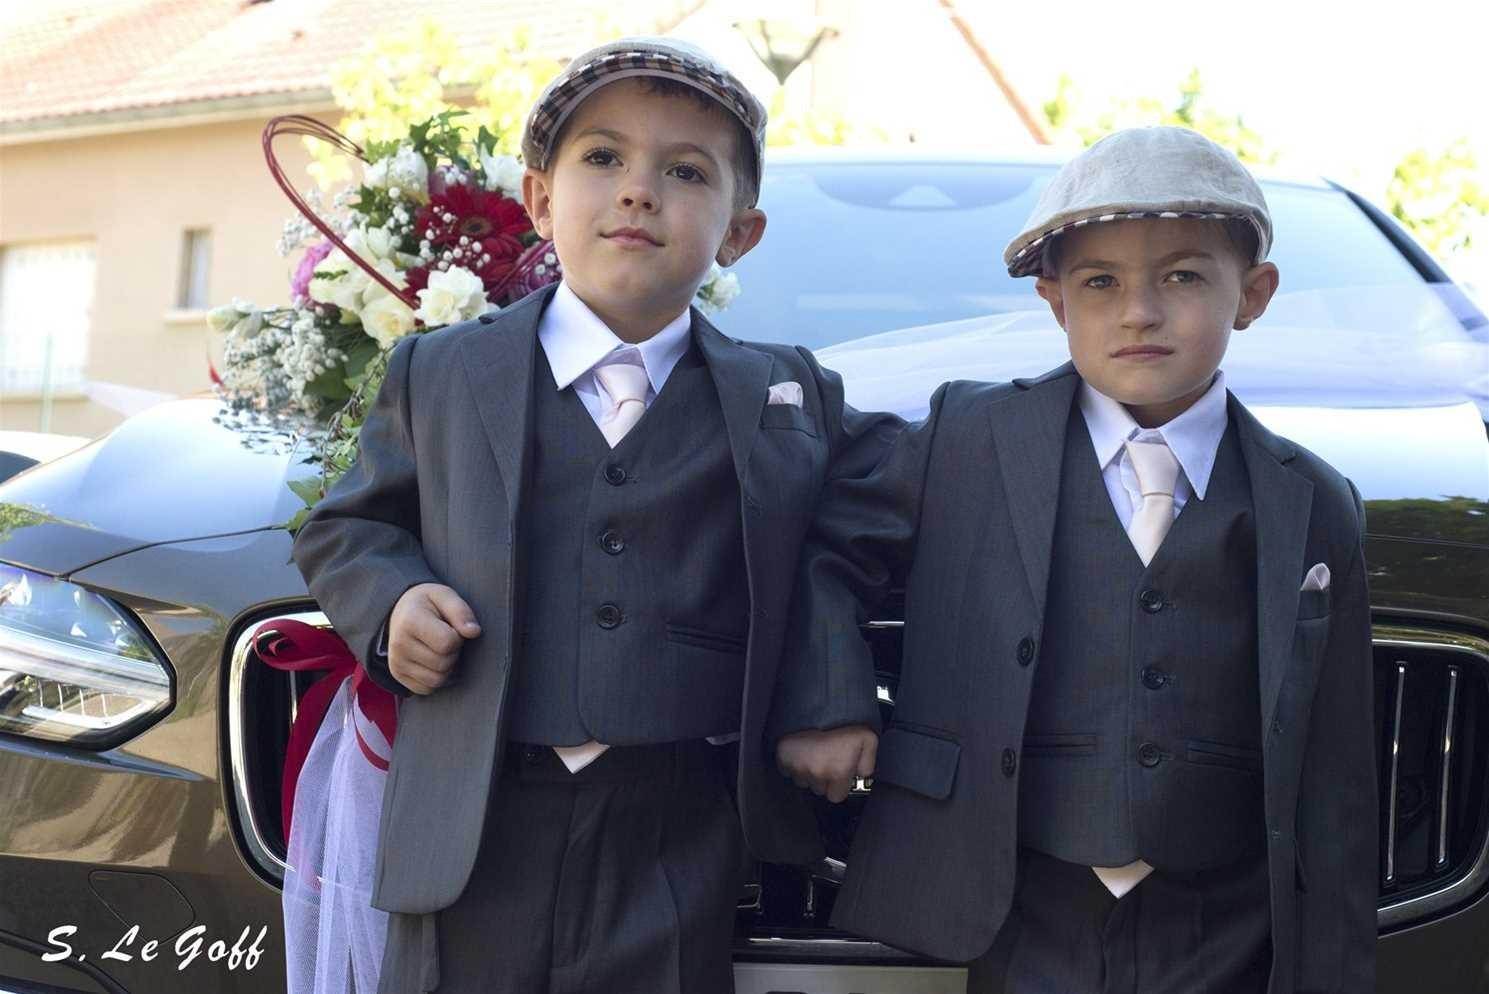 Petits garçons d'honneur